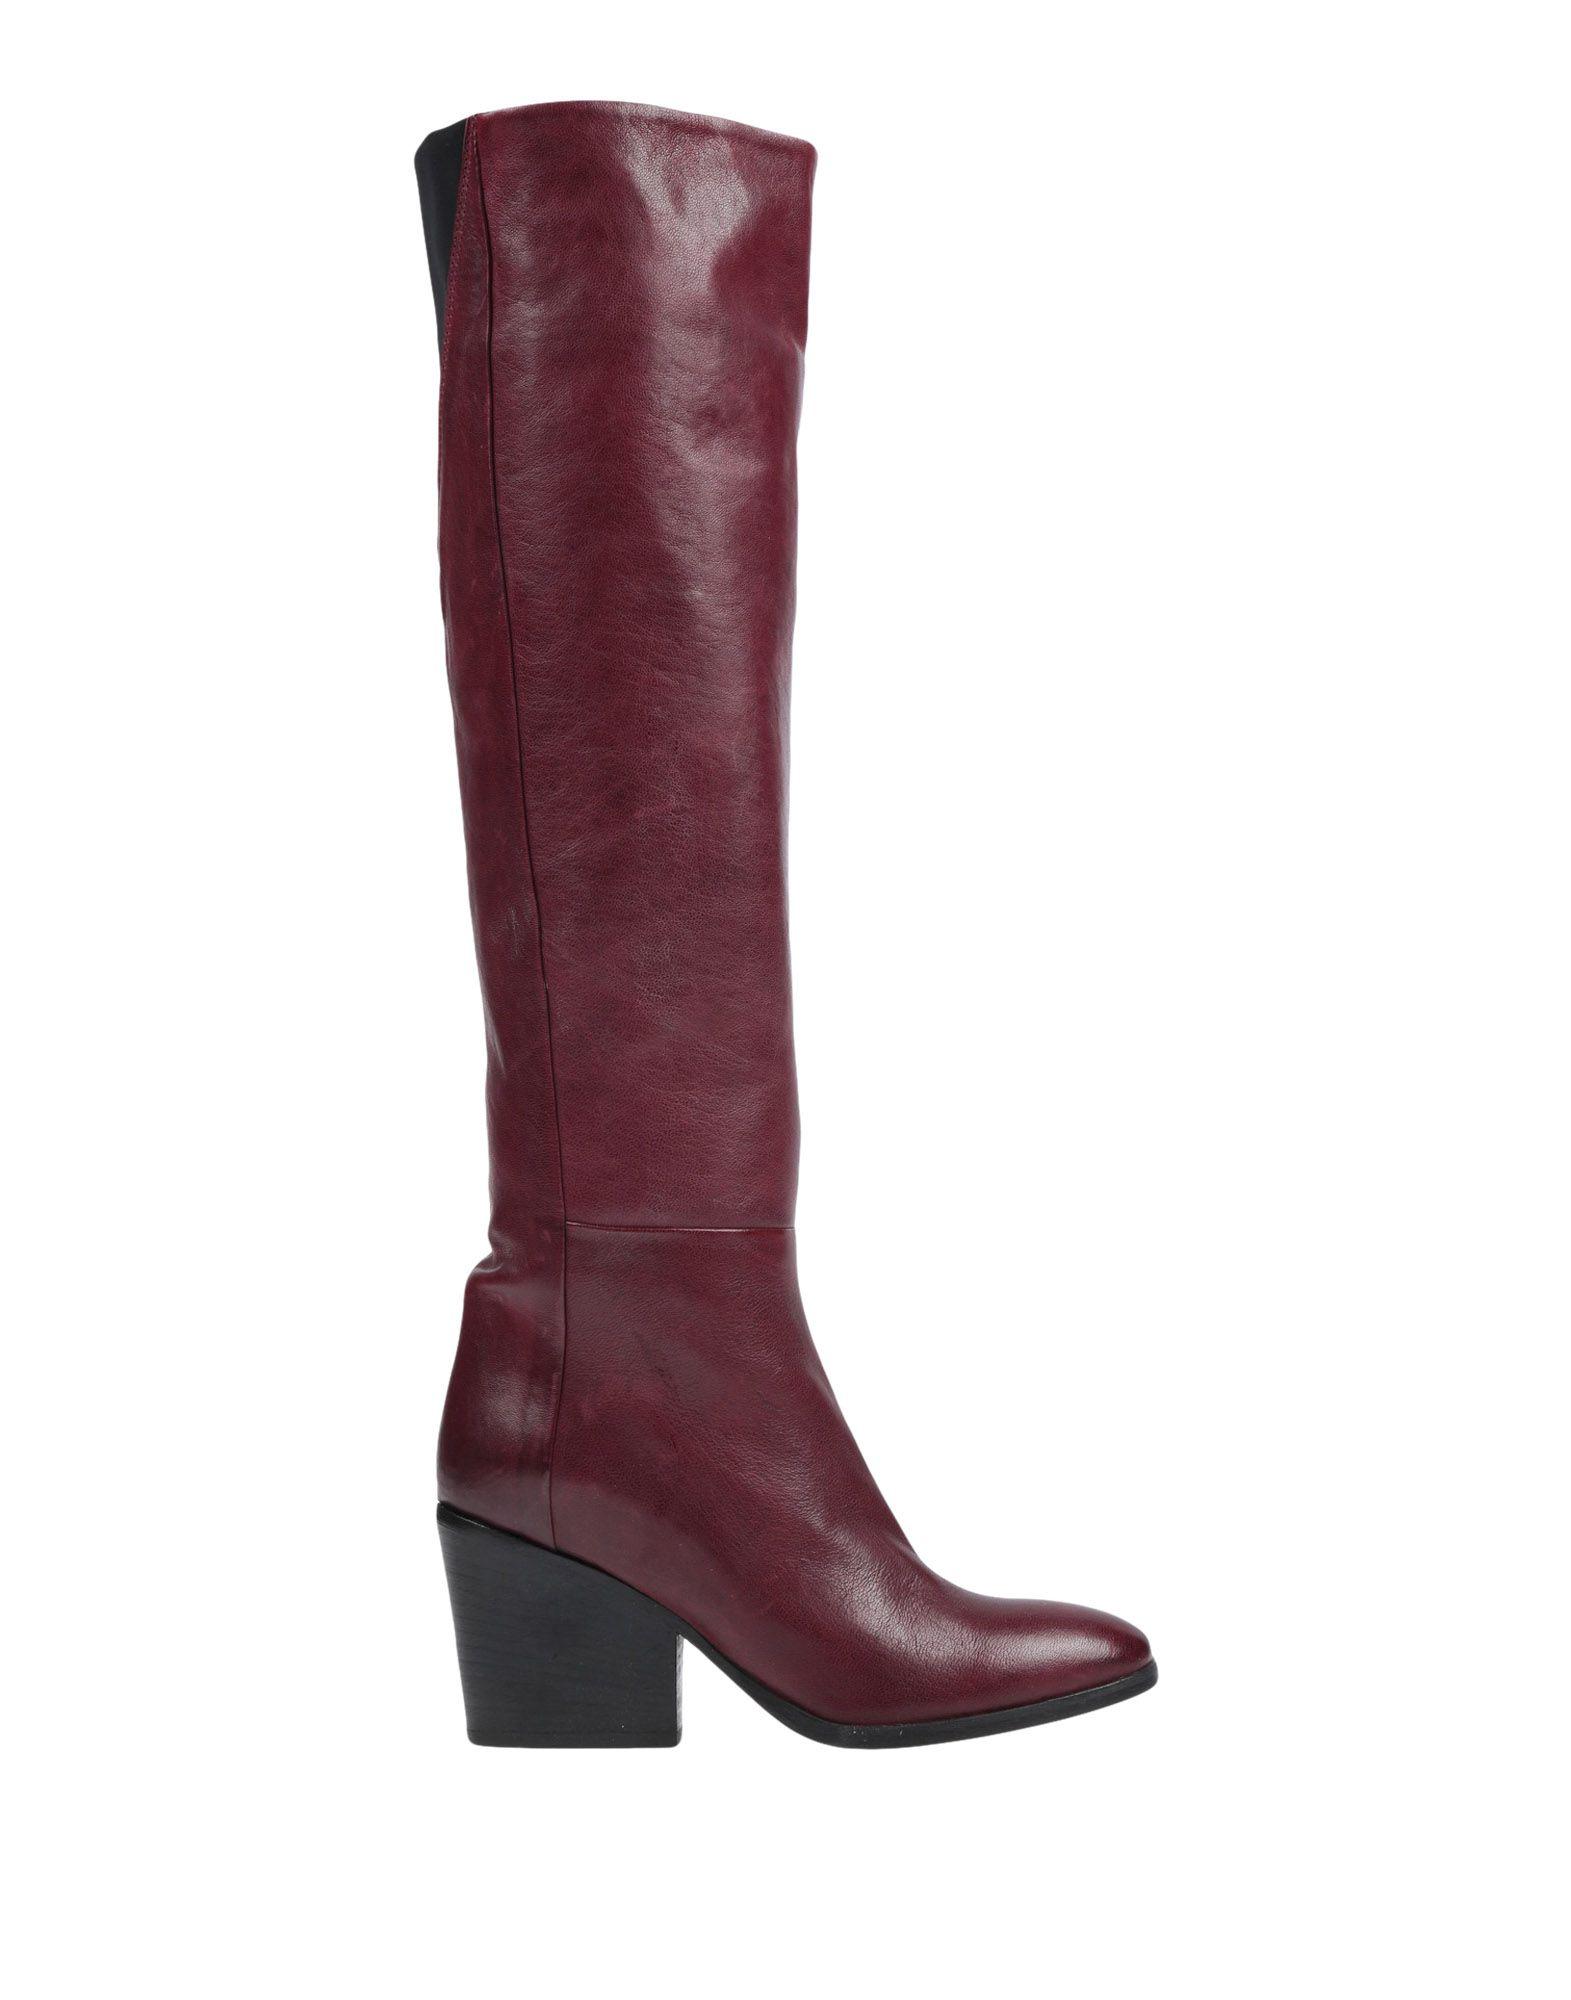 Moda Stivali Fiorifrancesi Donna - 11239245BC